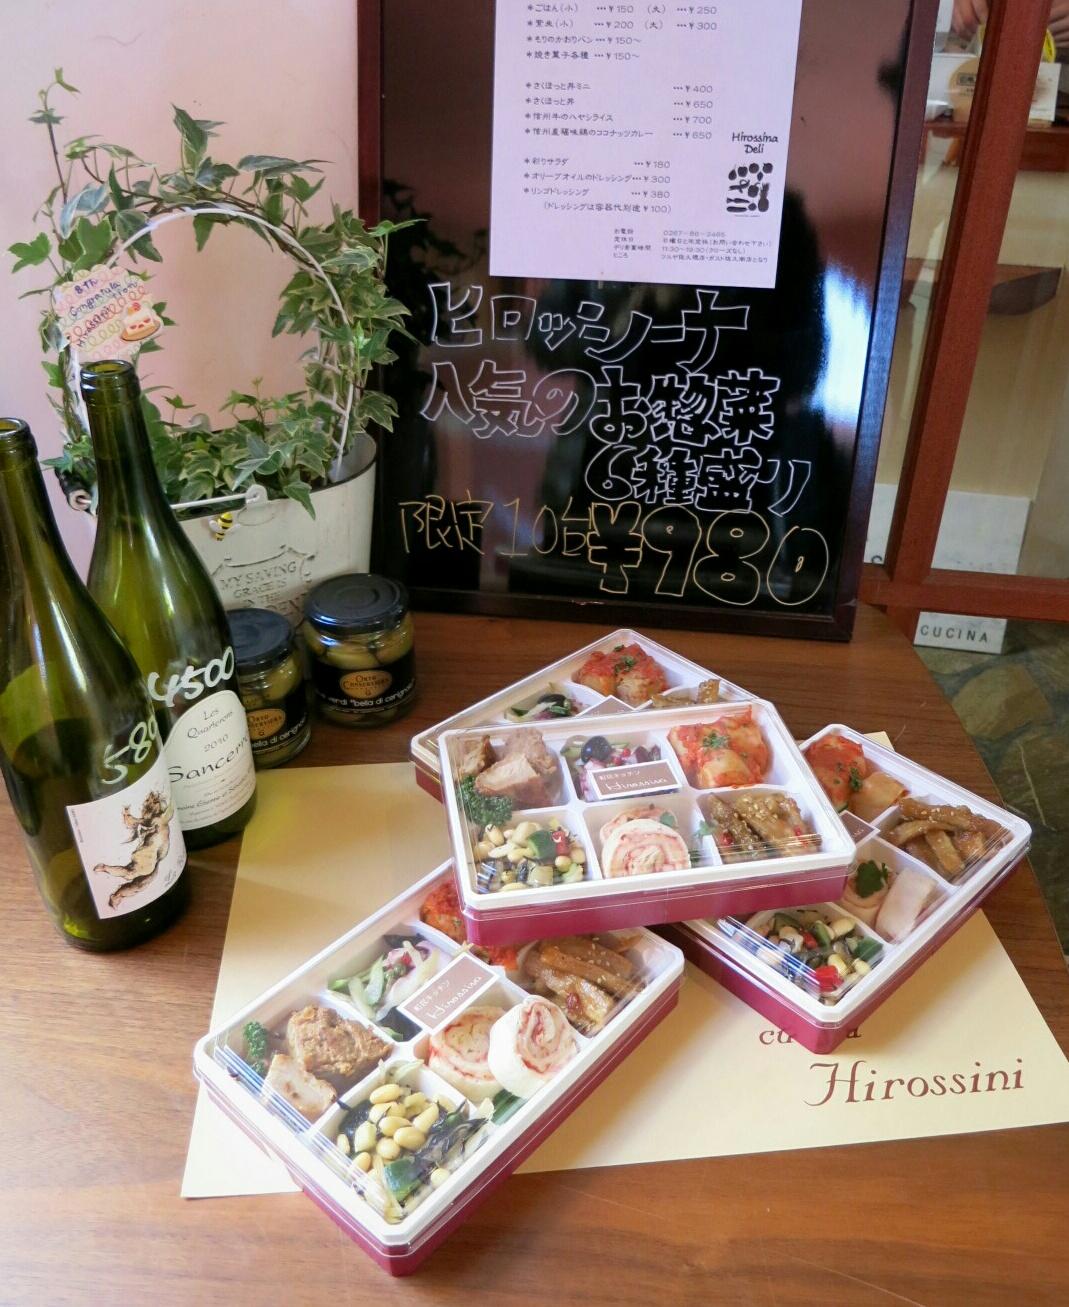 cucina Hirossini☆クッチーナ・ヒロッシーニのランチ @佐久平_f0236260_234288.jpg